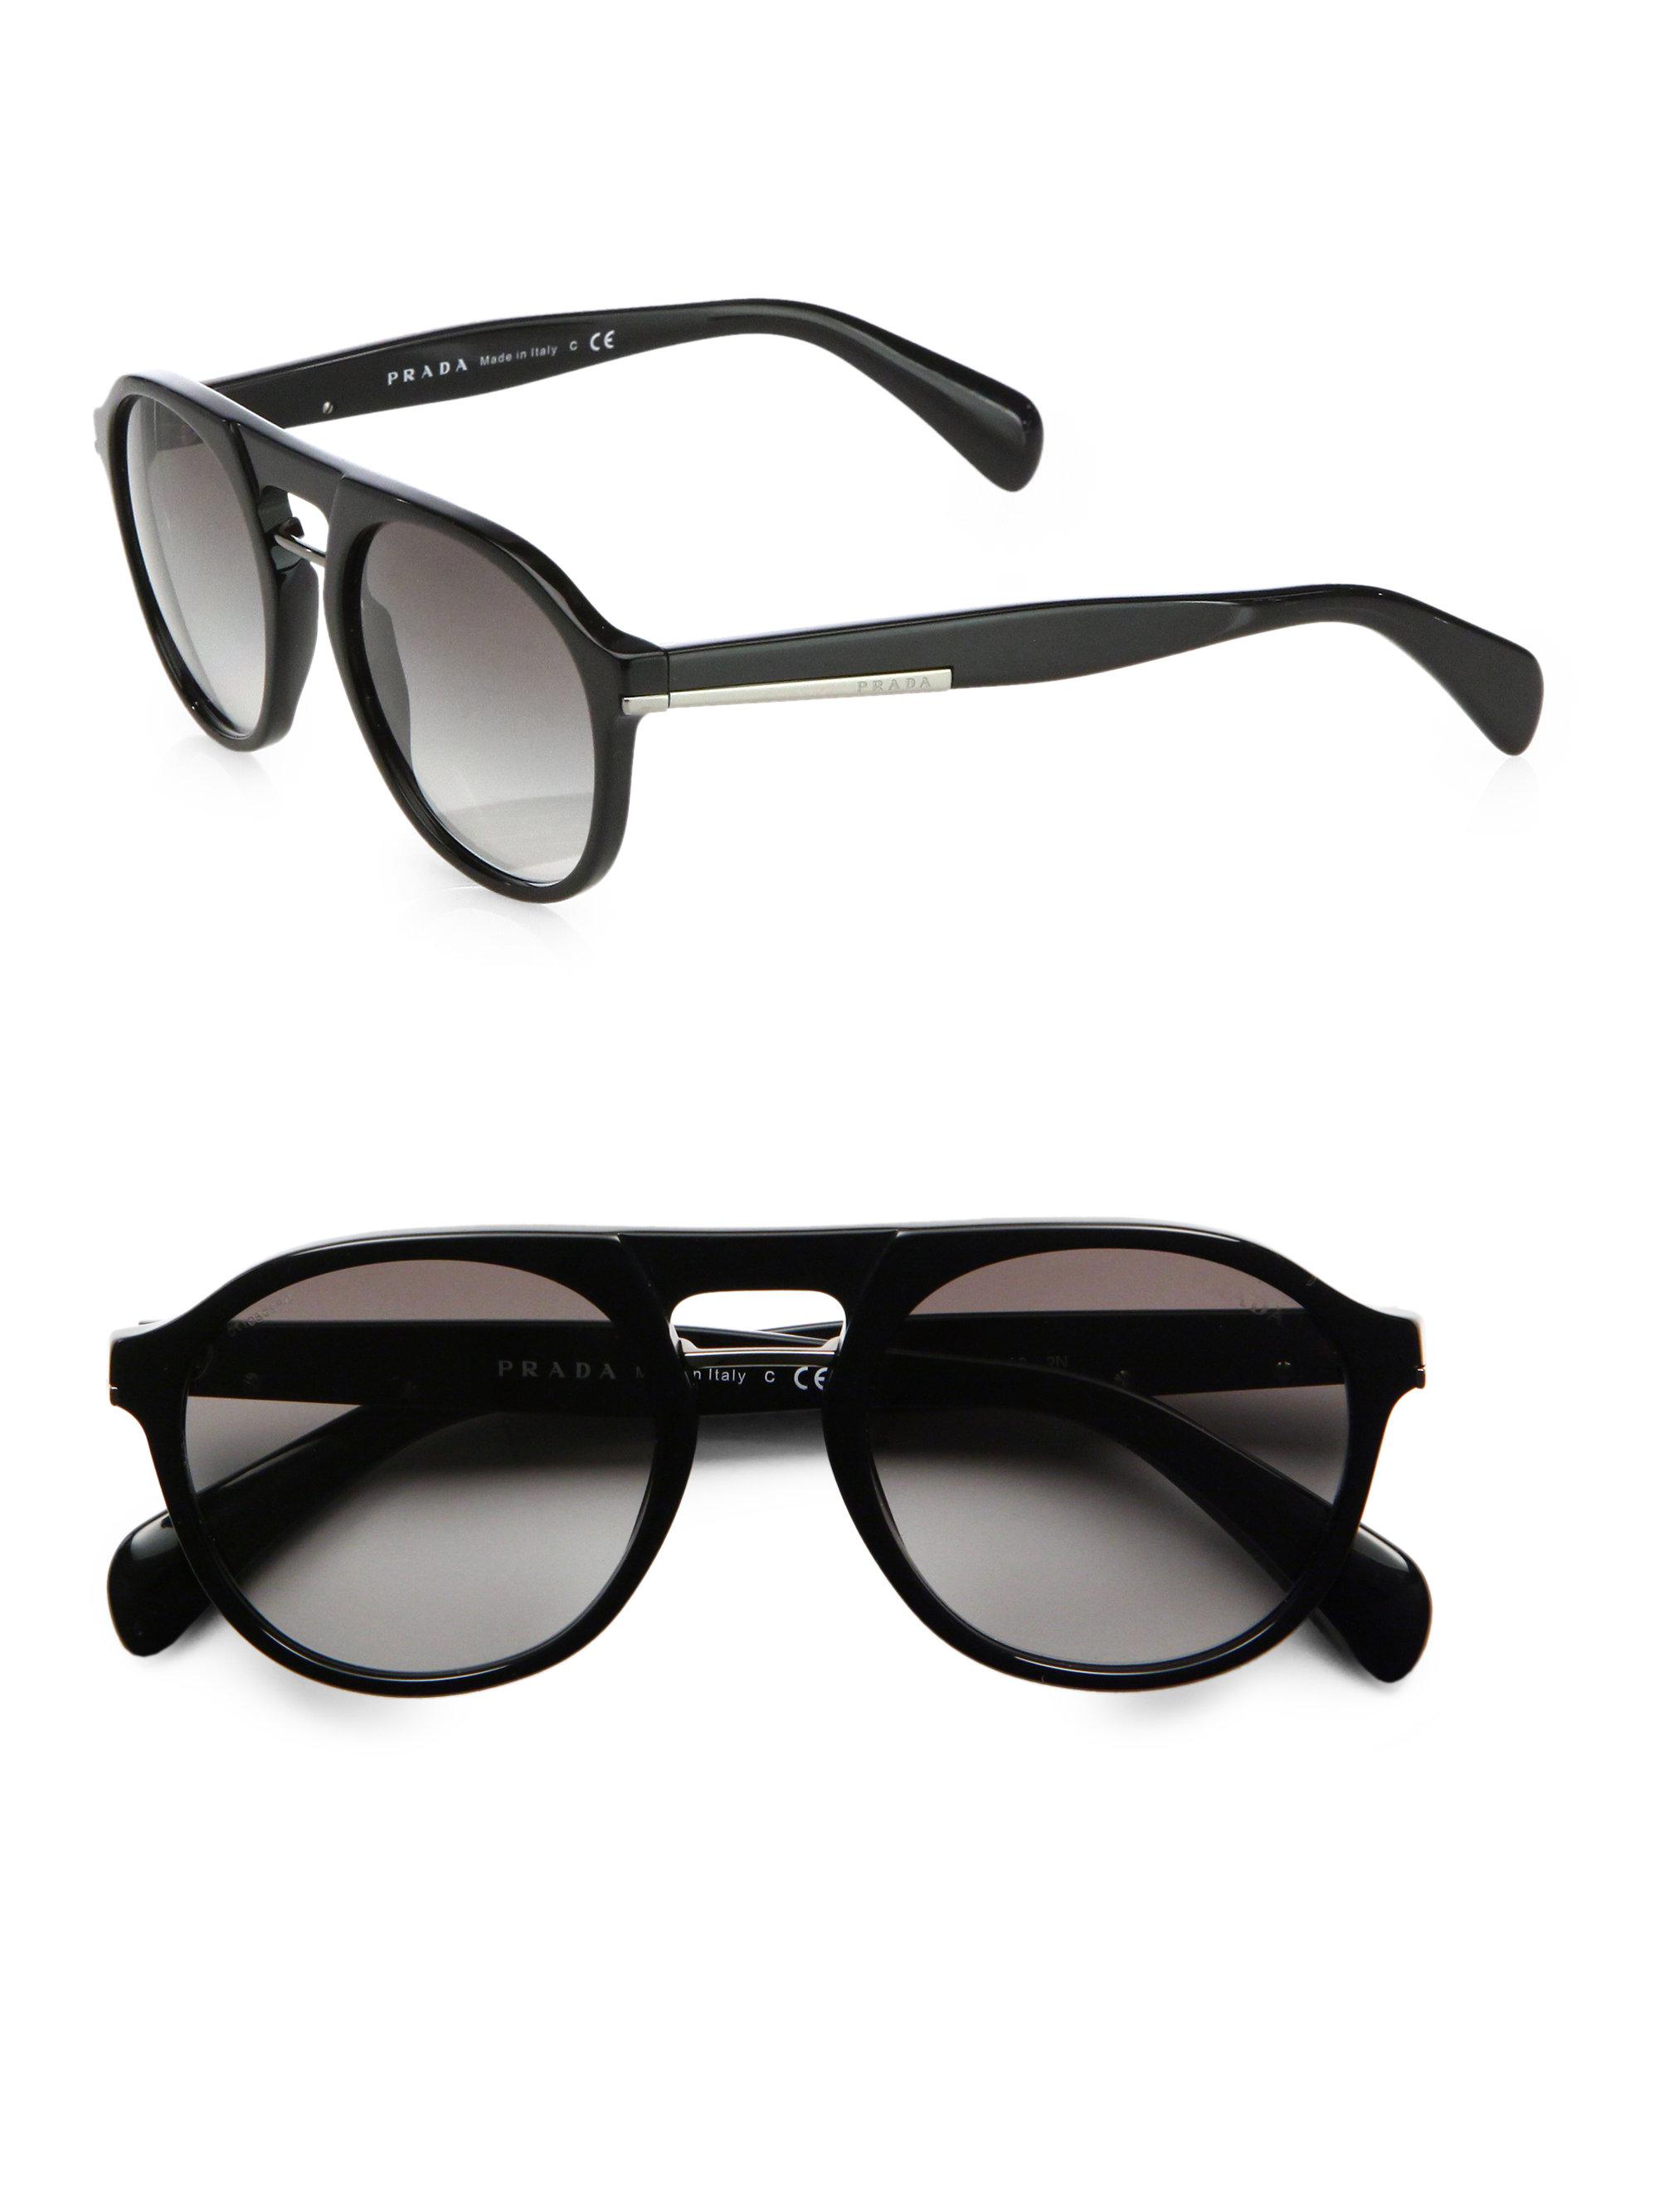 a9cfc1d5a526 ... france prada plastic keyhole sunglasses in black for men lyst d4901  dcd29